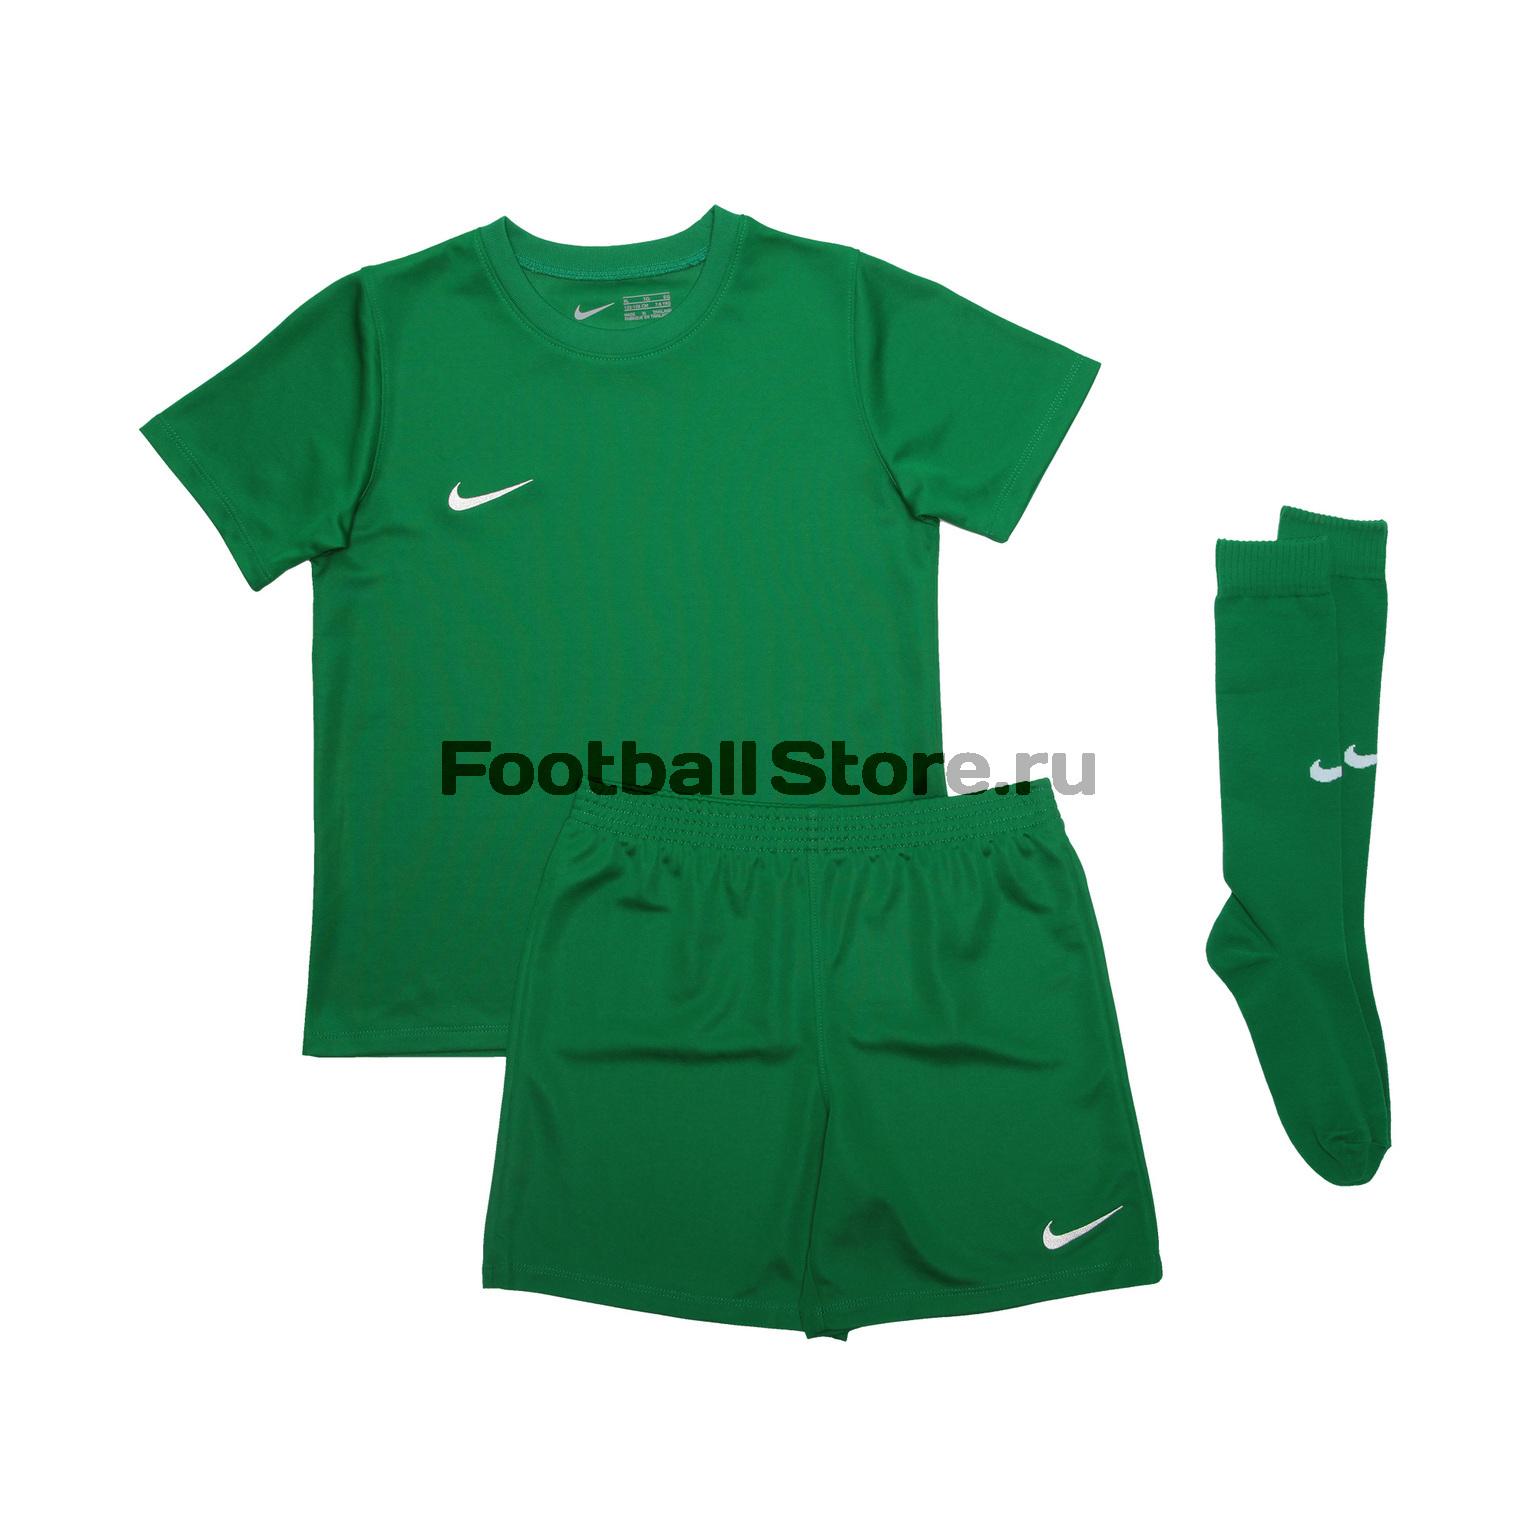 Комплект детской формы Nike Dry Park Kit Set AH5487-302 mk8 aluminum extruder kit with nema 17 stepper motor 1 75mm for 3d printer reprap prusa i3